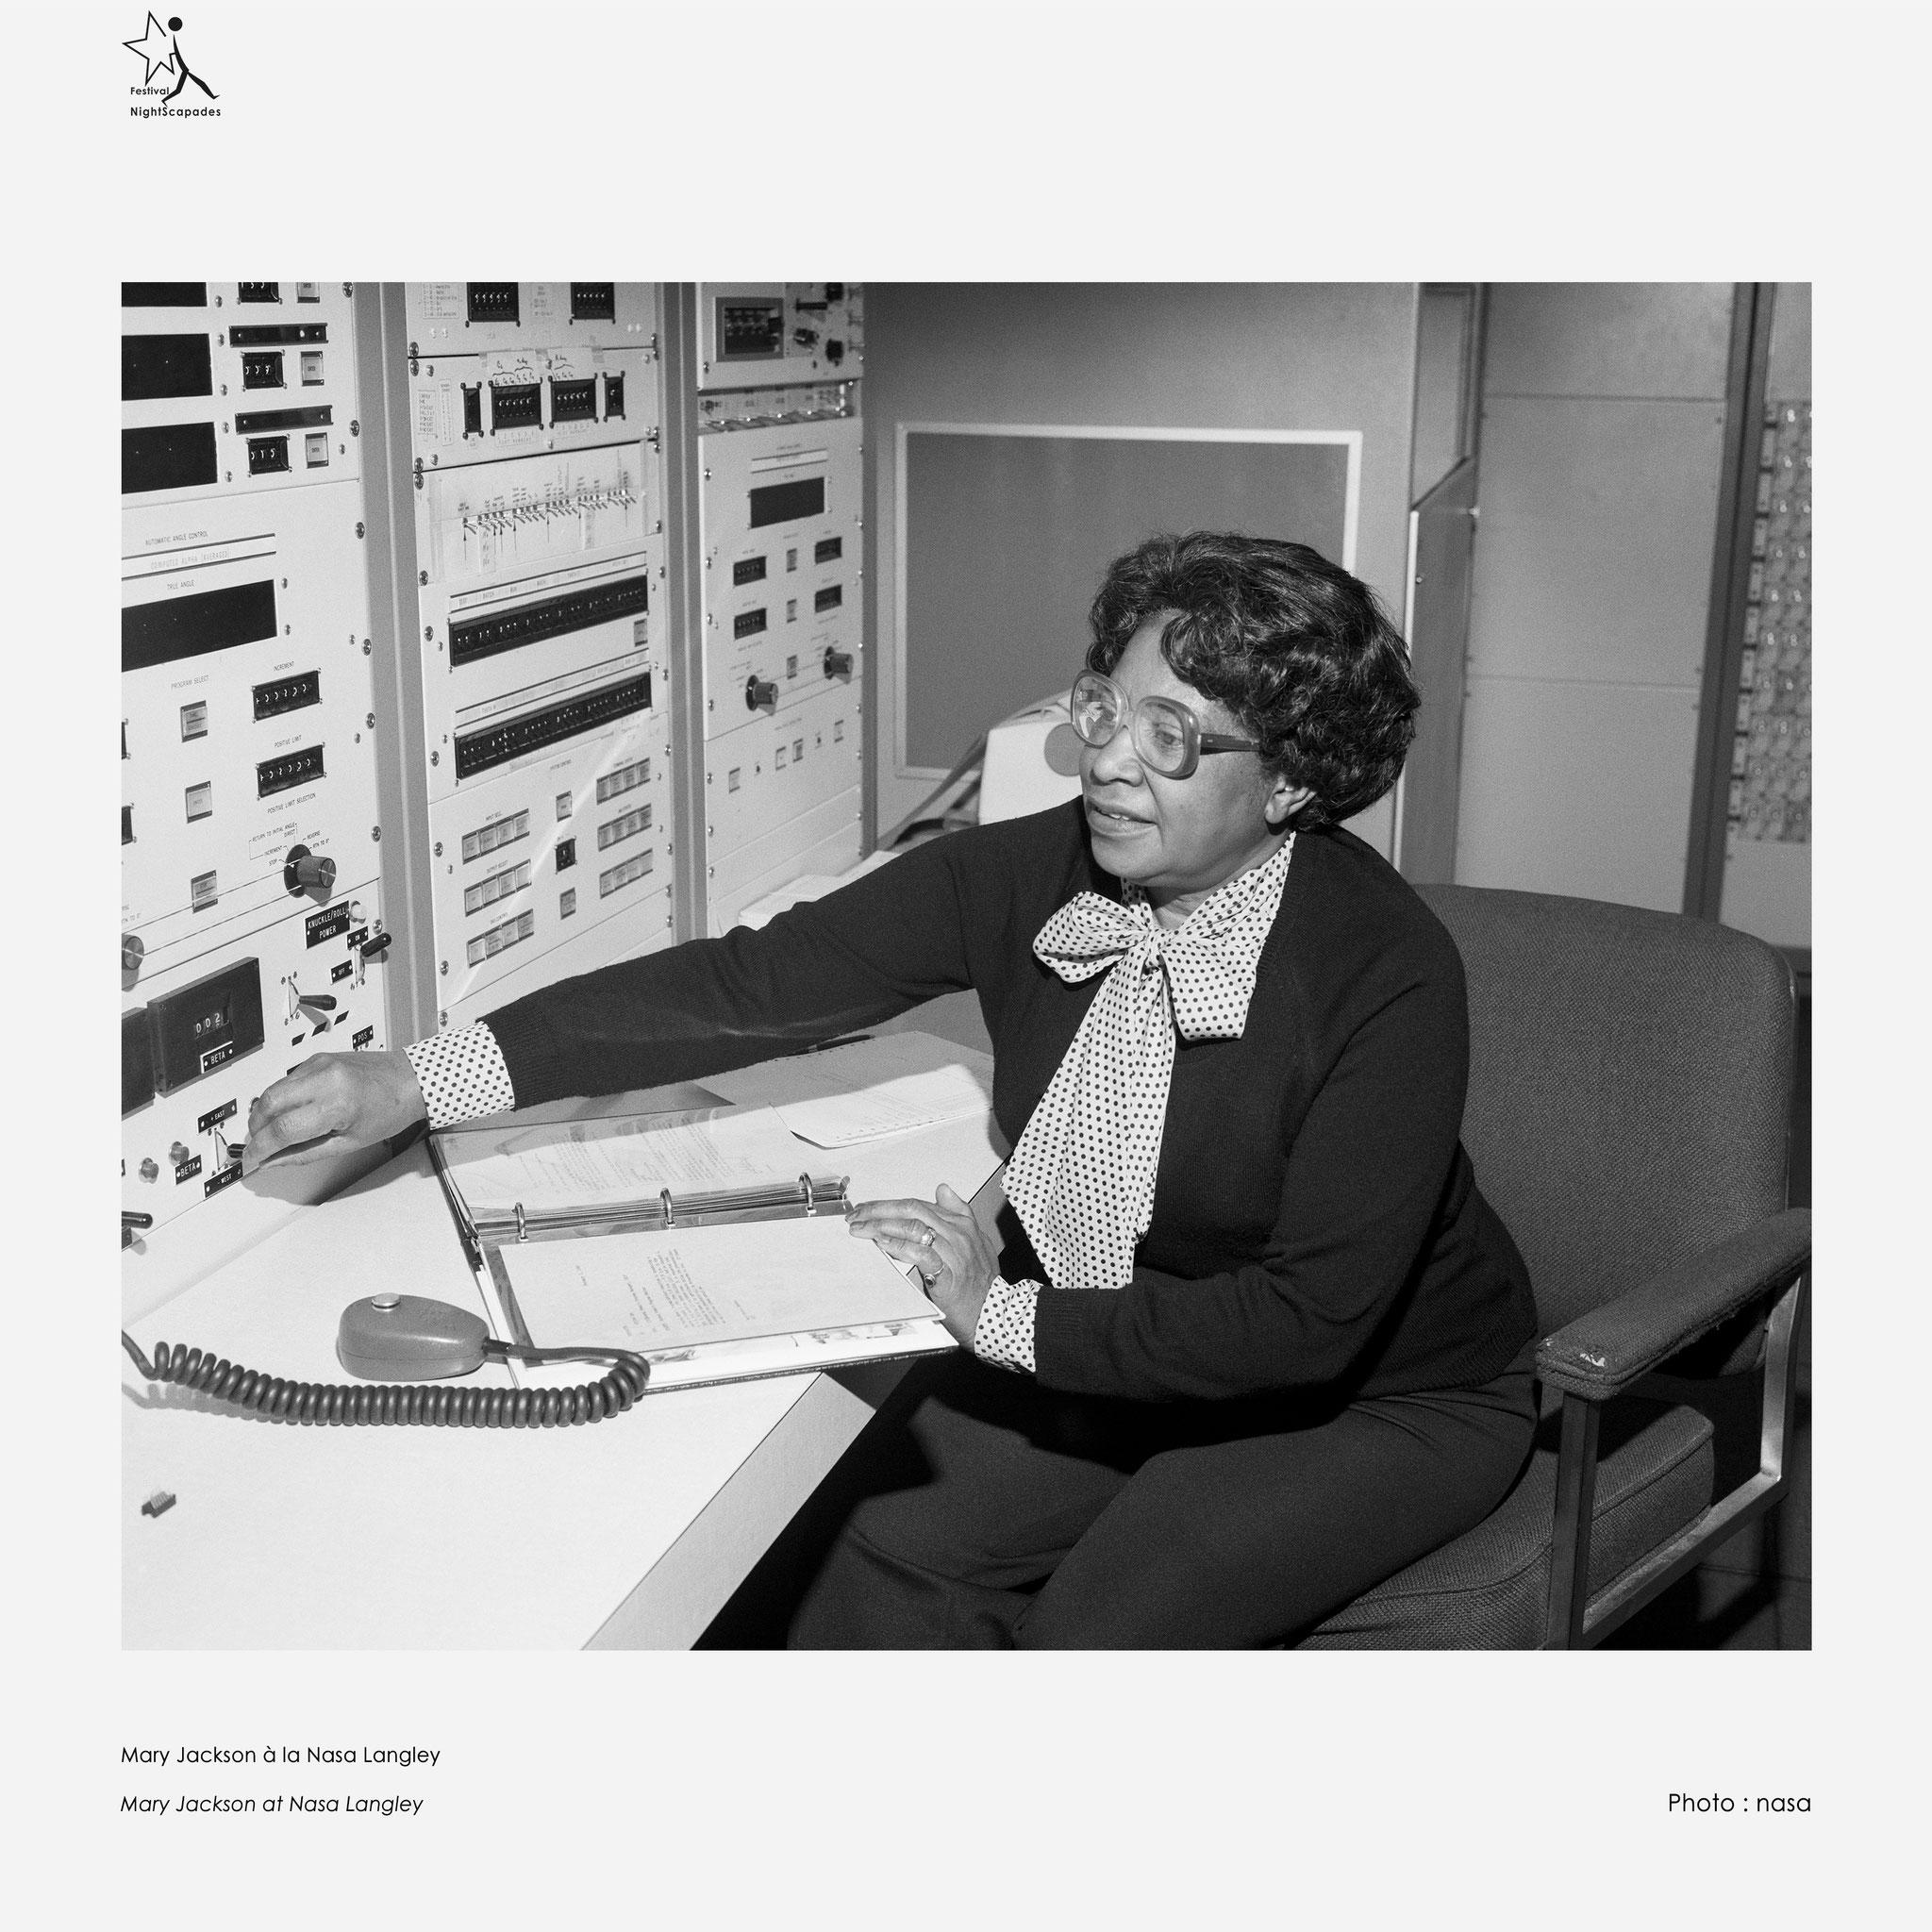 Mary Jackson à la NASA Langley n°1